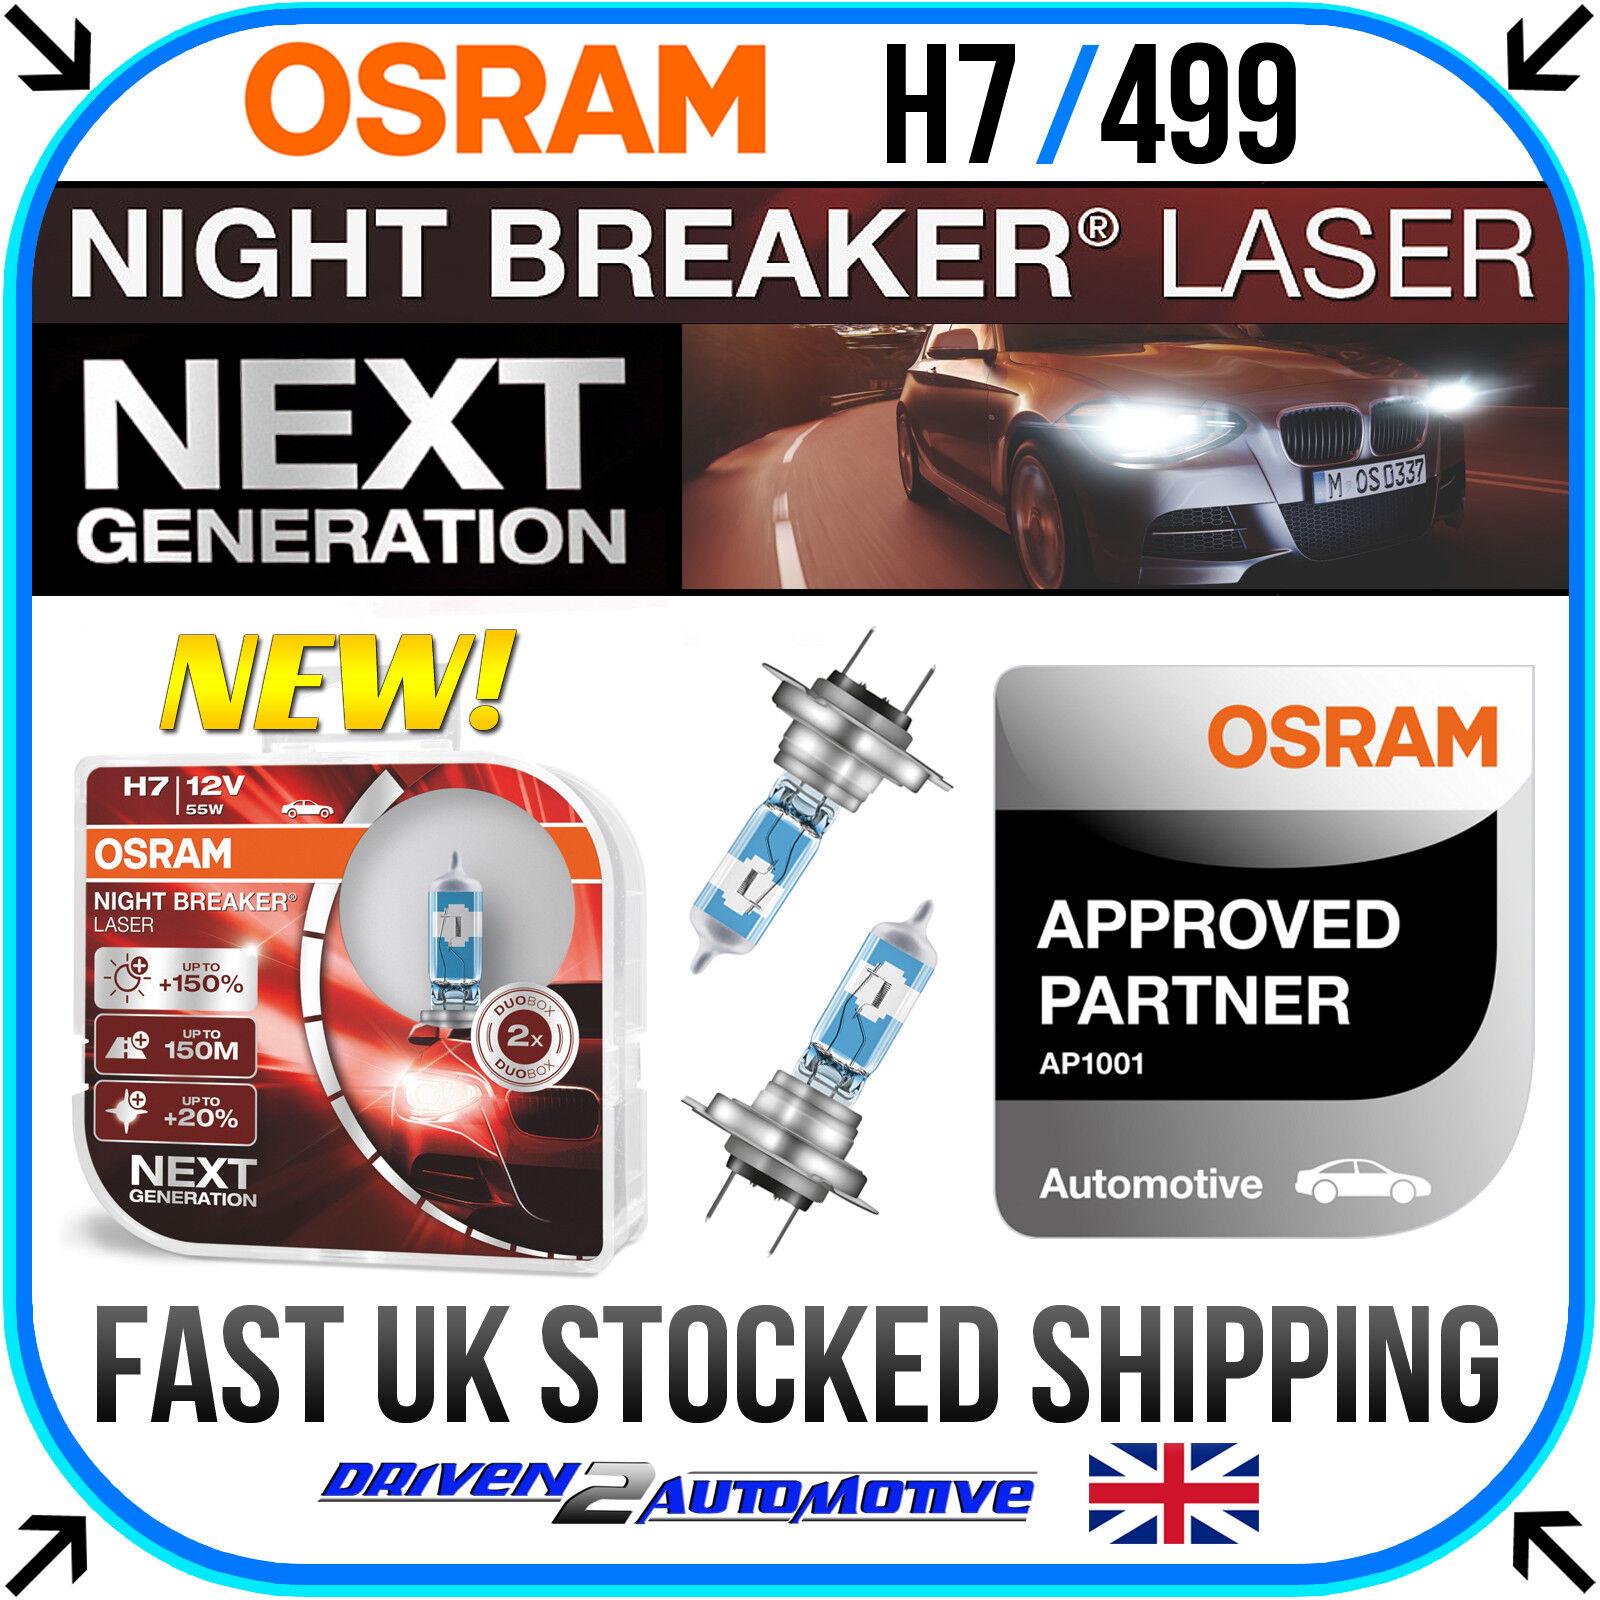 Car Parts - OSRAM Night Breaker LASER NEXT GEN H7 Car Headlight Bulbs 55W +150% Twin Duo